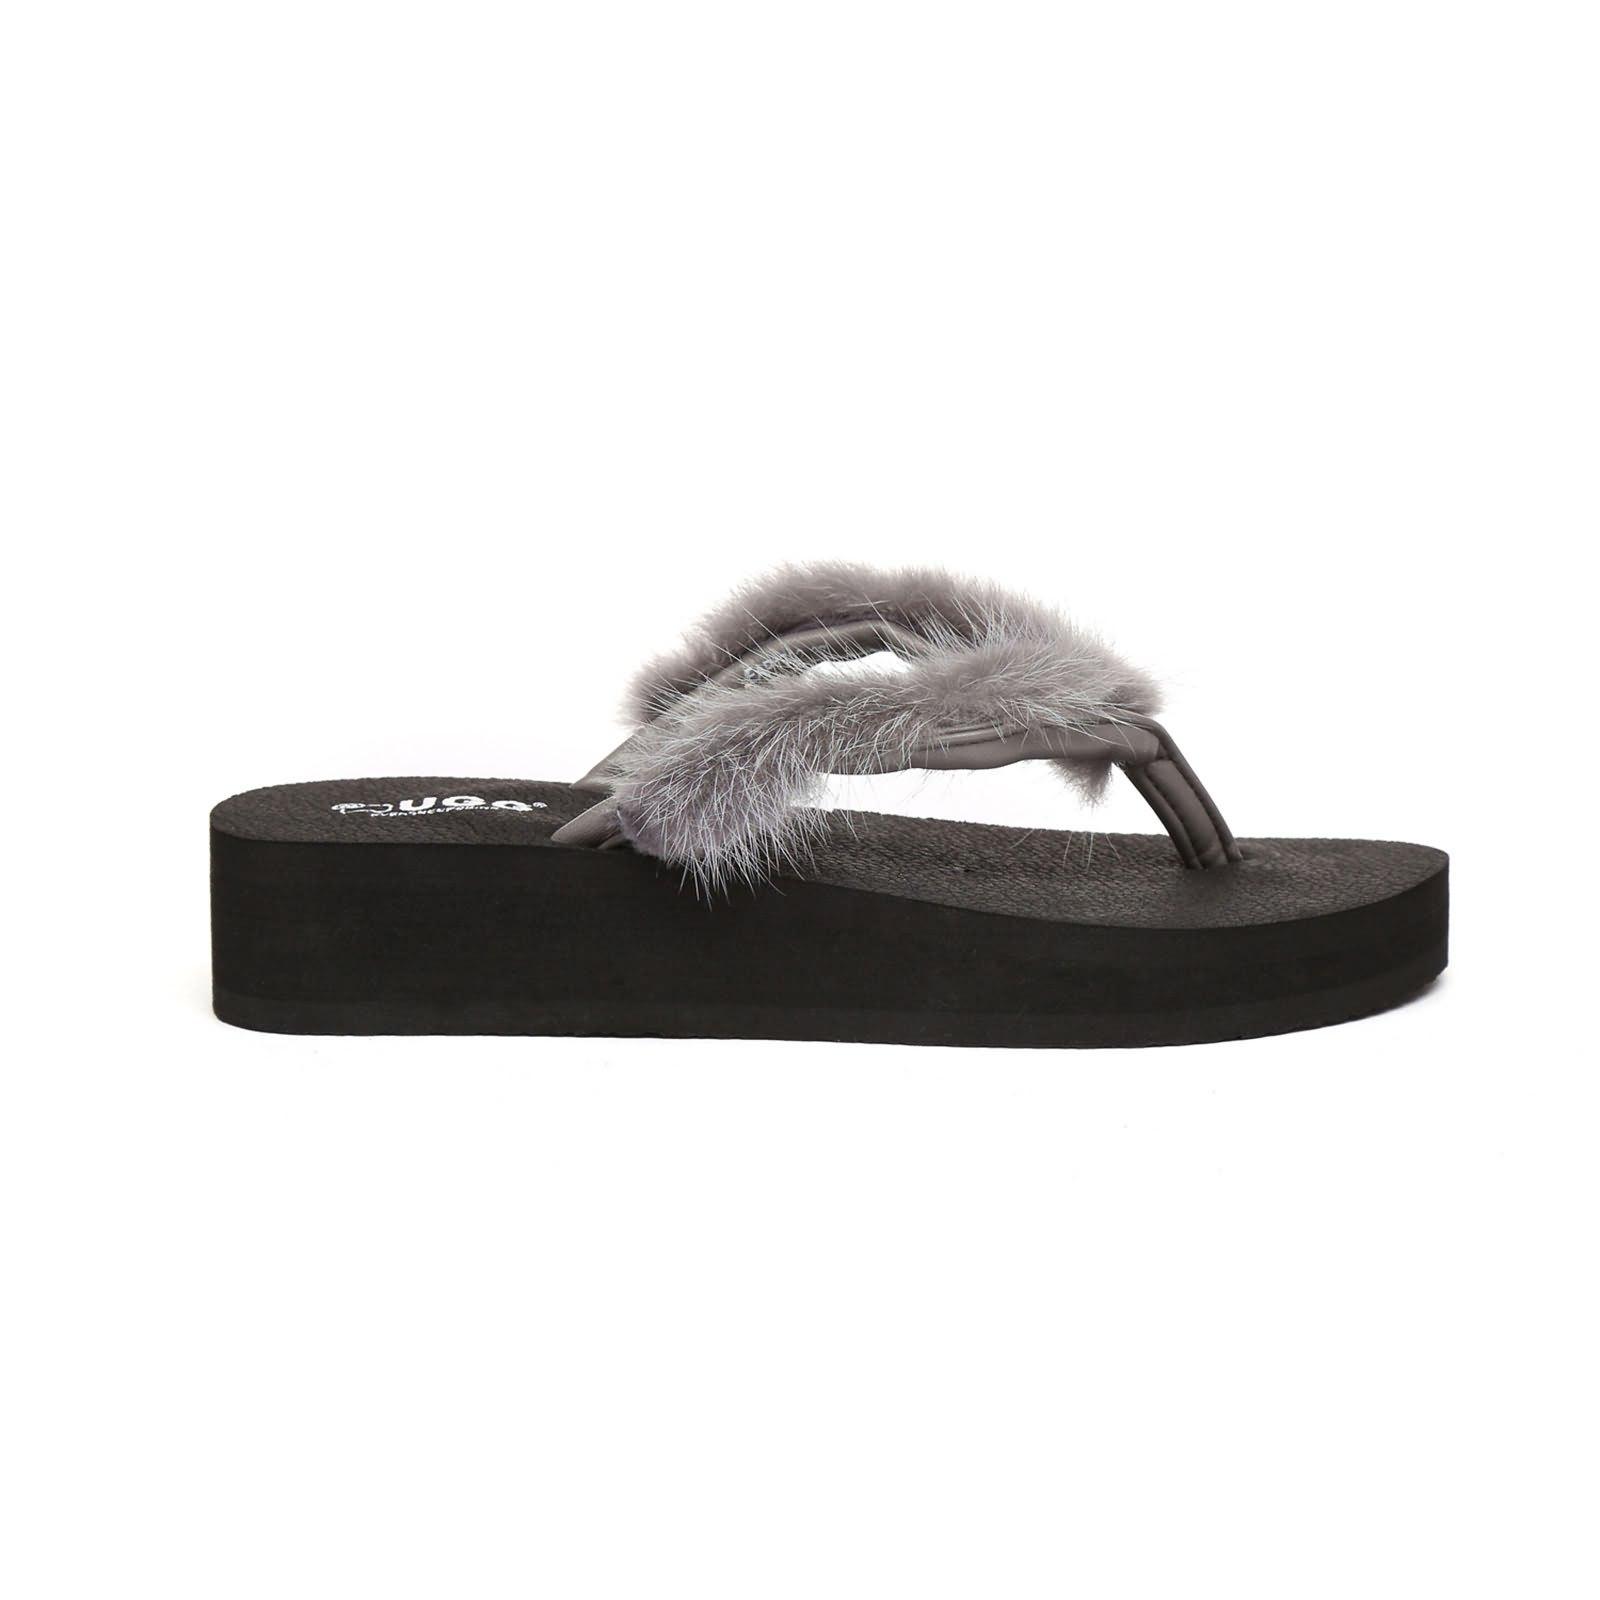 1c828890852b UGG Faye Women Comfort Fashion Wedge Platform Thongs Flip Flops Slippers  Sandals .